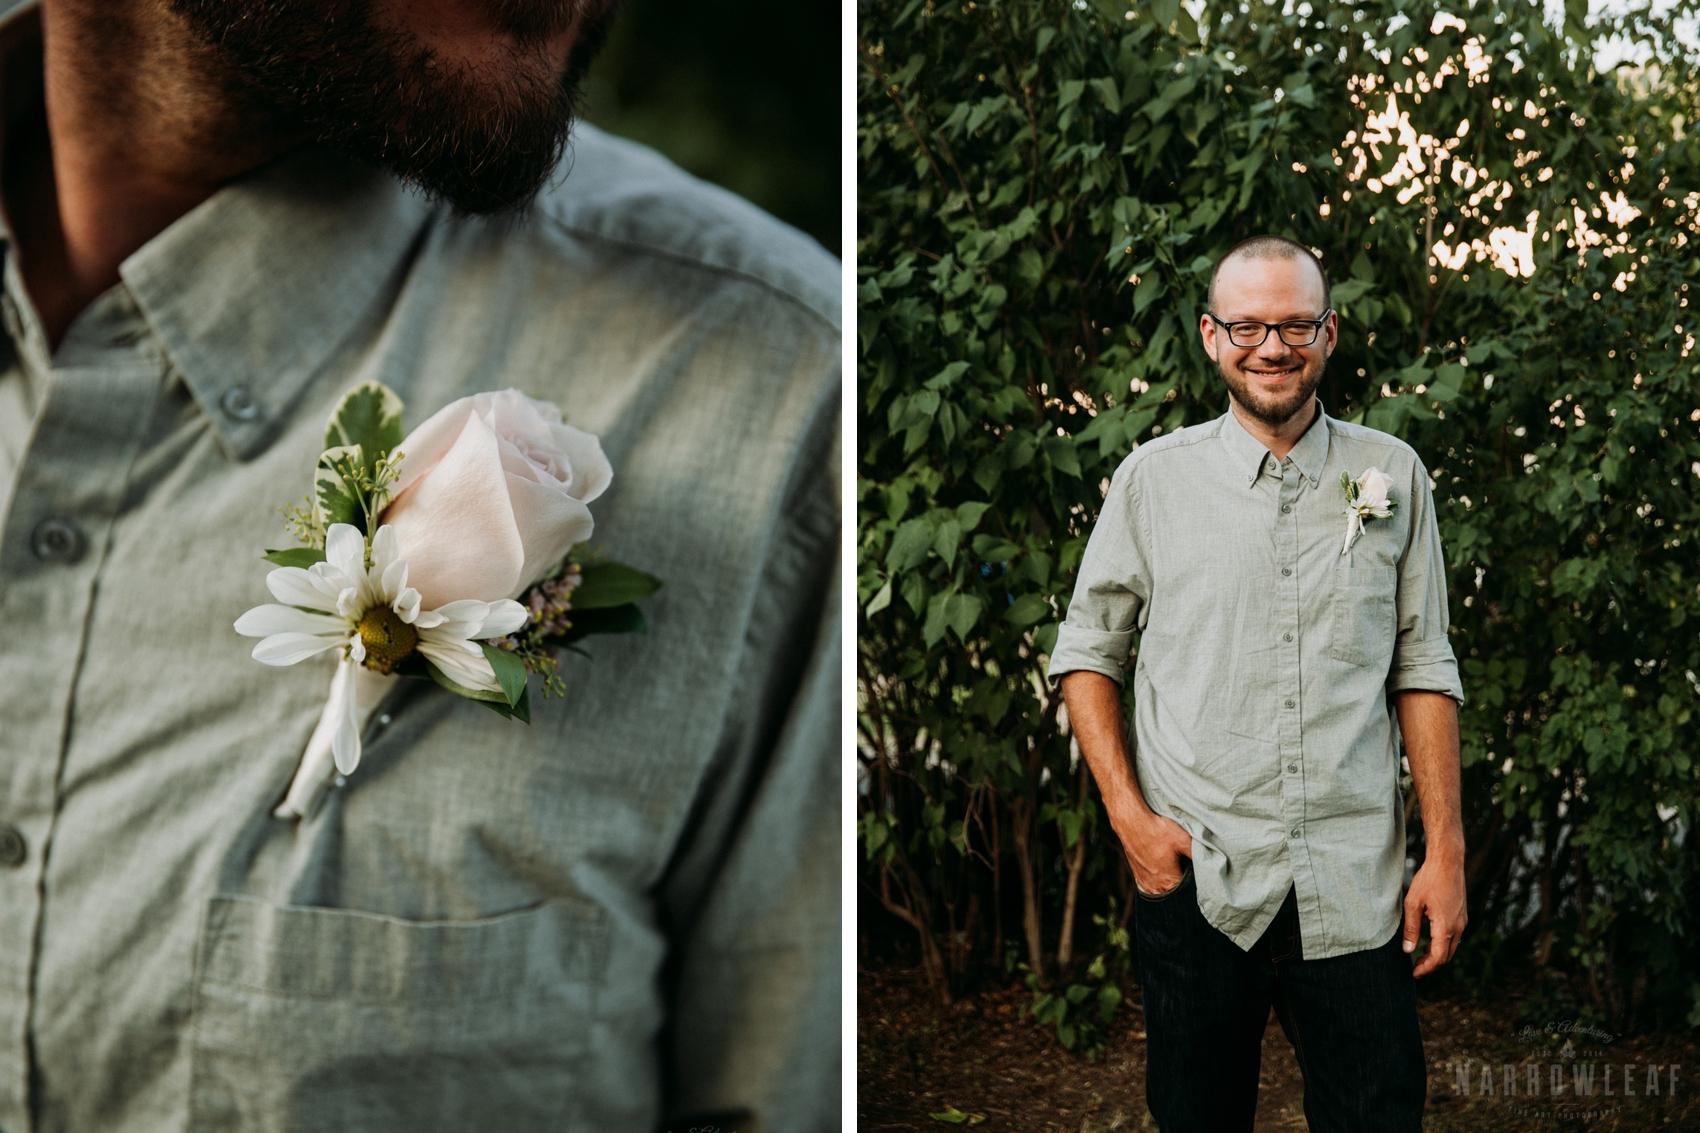 minnesota-outdoor-elopement-groom-style-narrowLeaf-photography.jpg